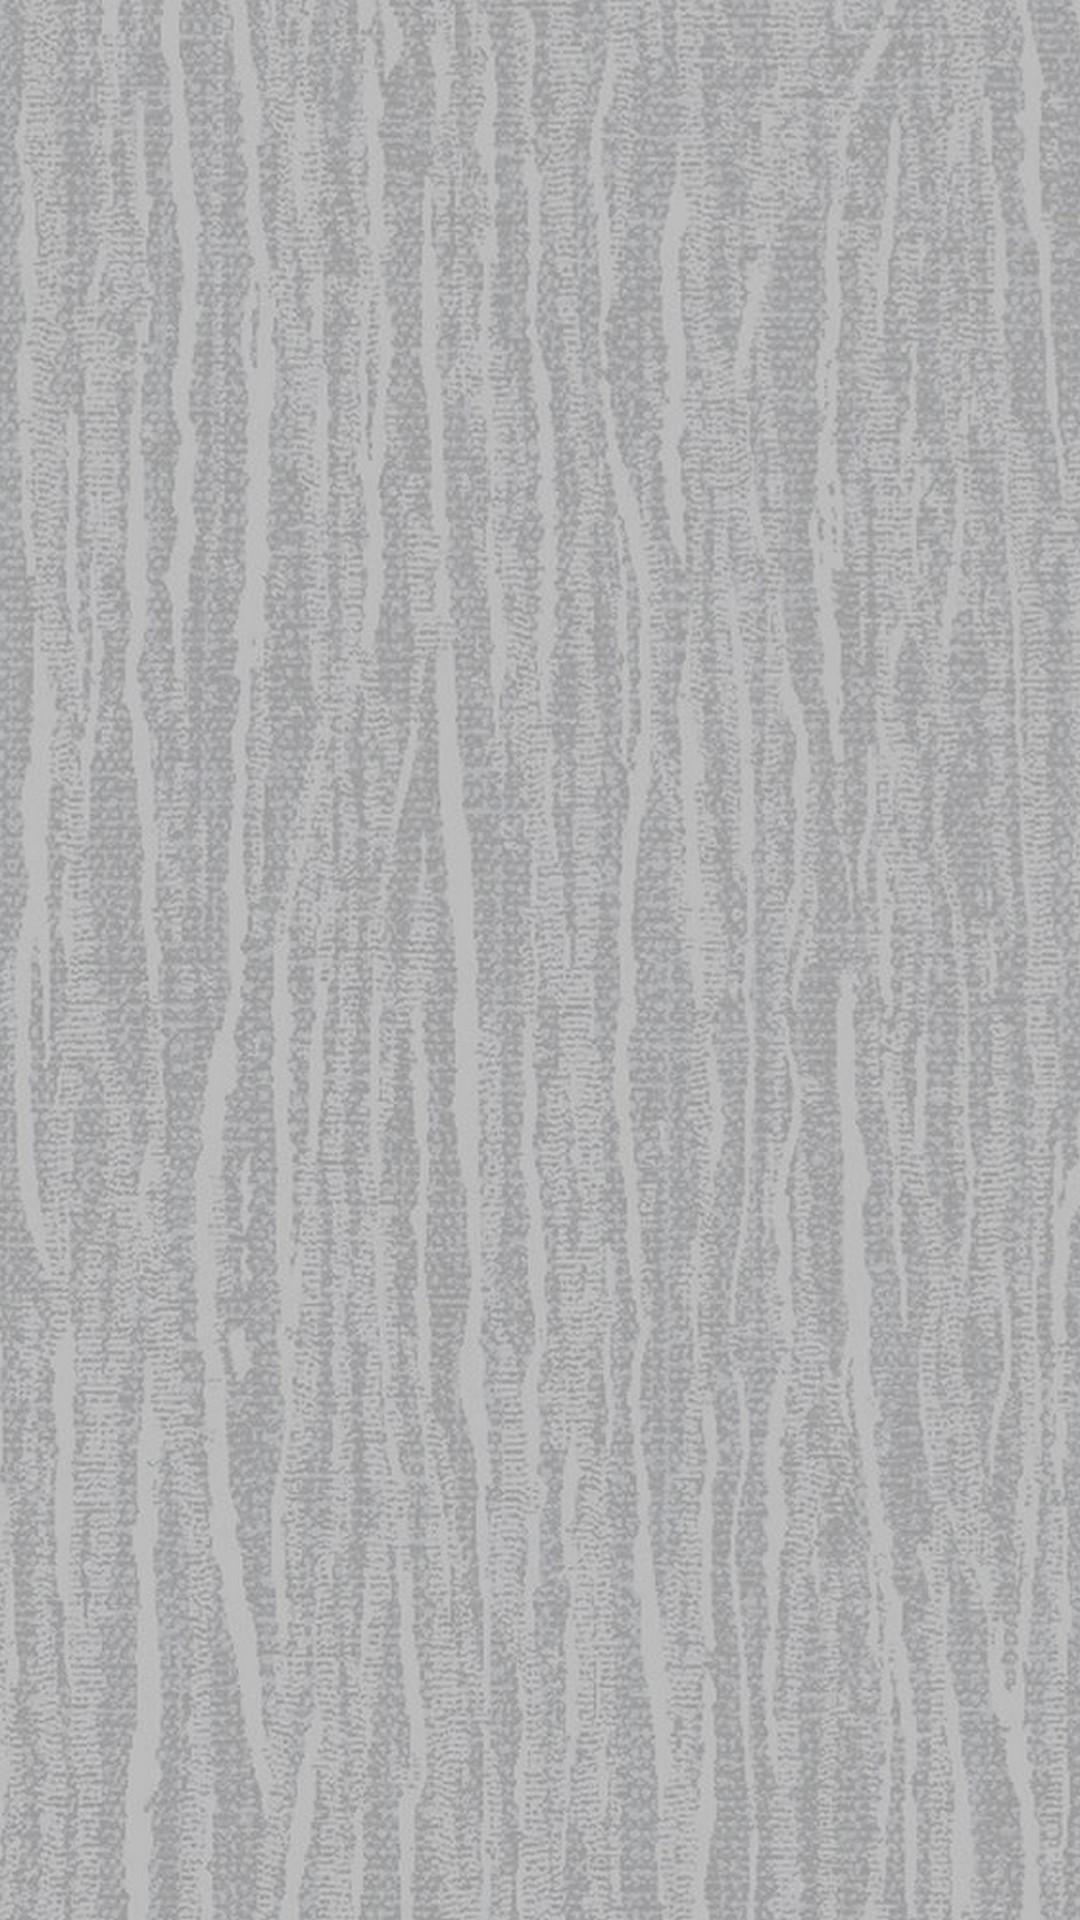 Wallpaper Iphone Silver Metallic